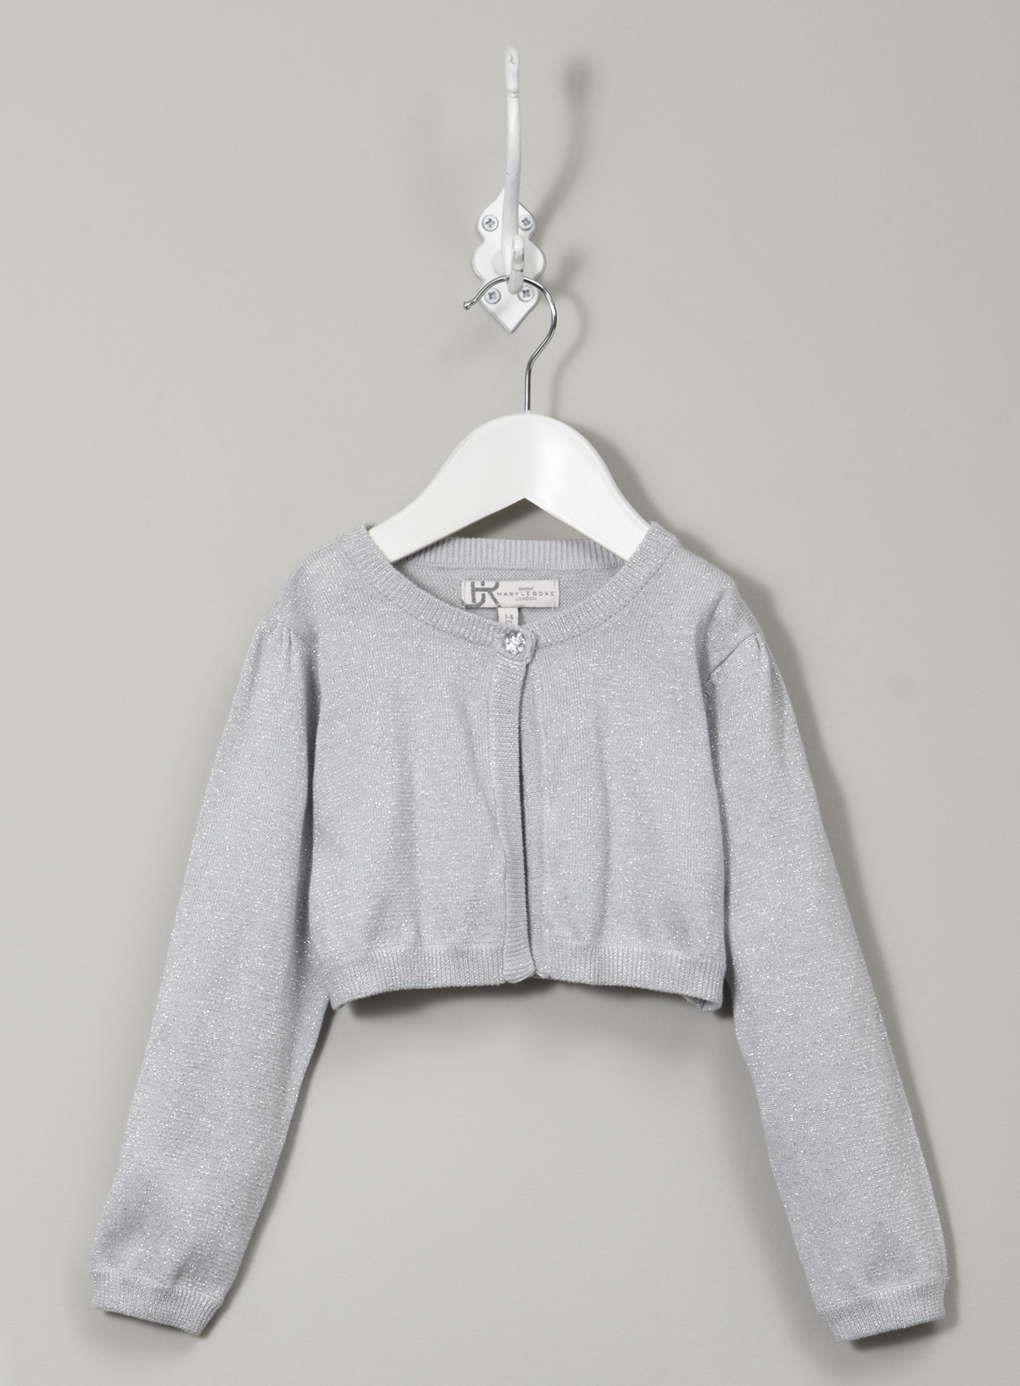 Silver Sparkly Cardigan - BHS | For my girls | Pinterest | Wedding ...